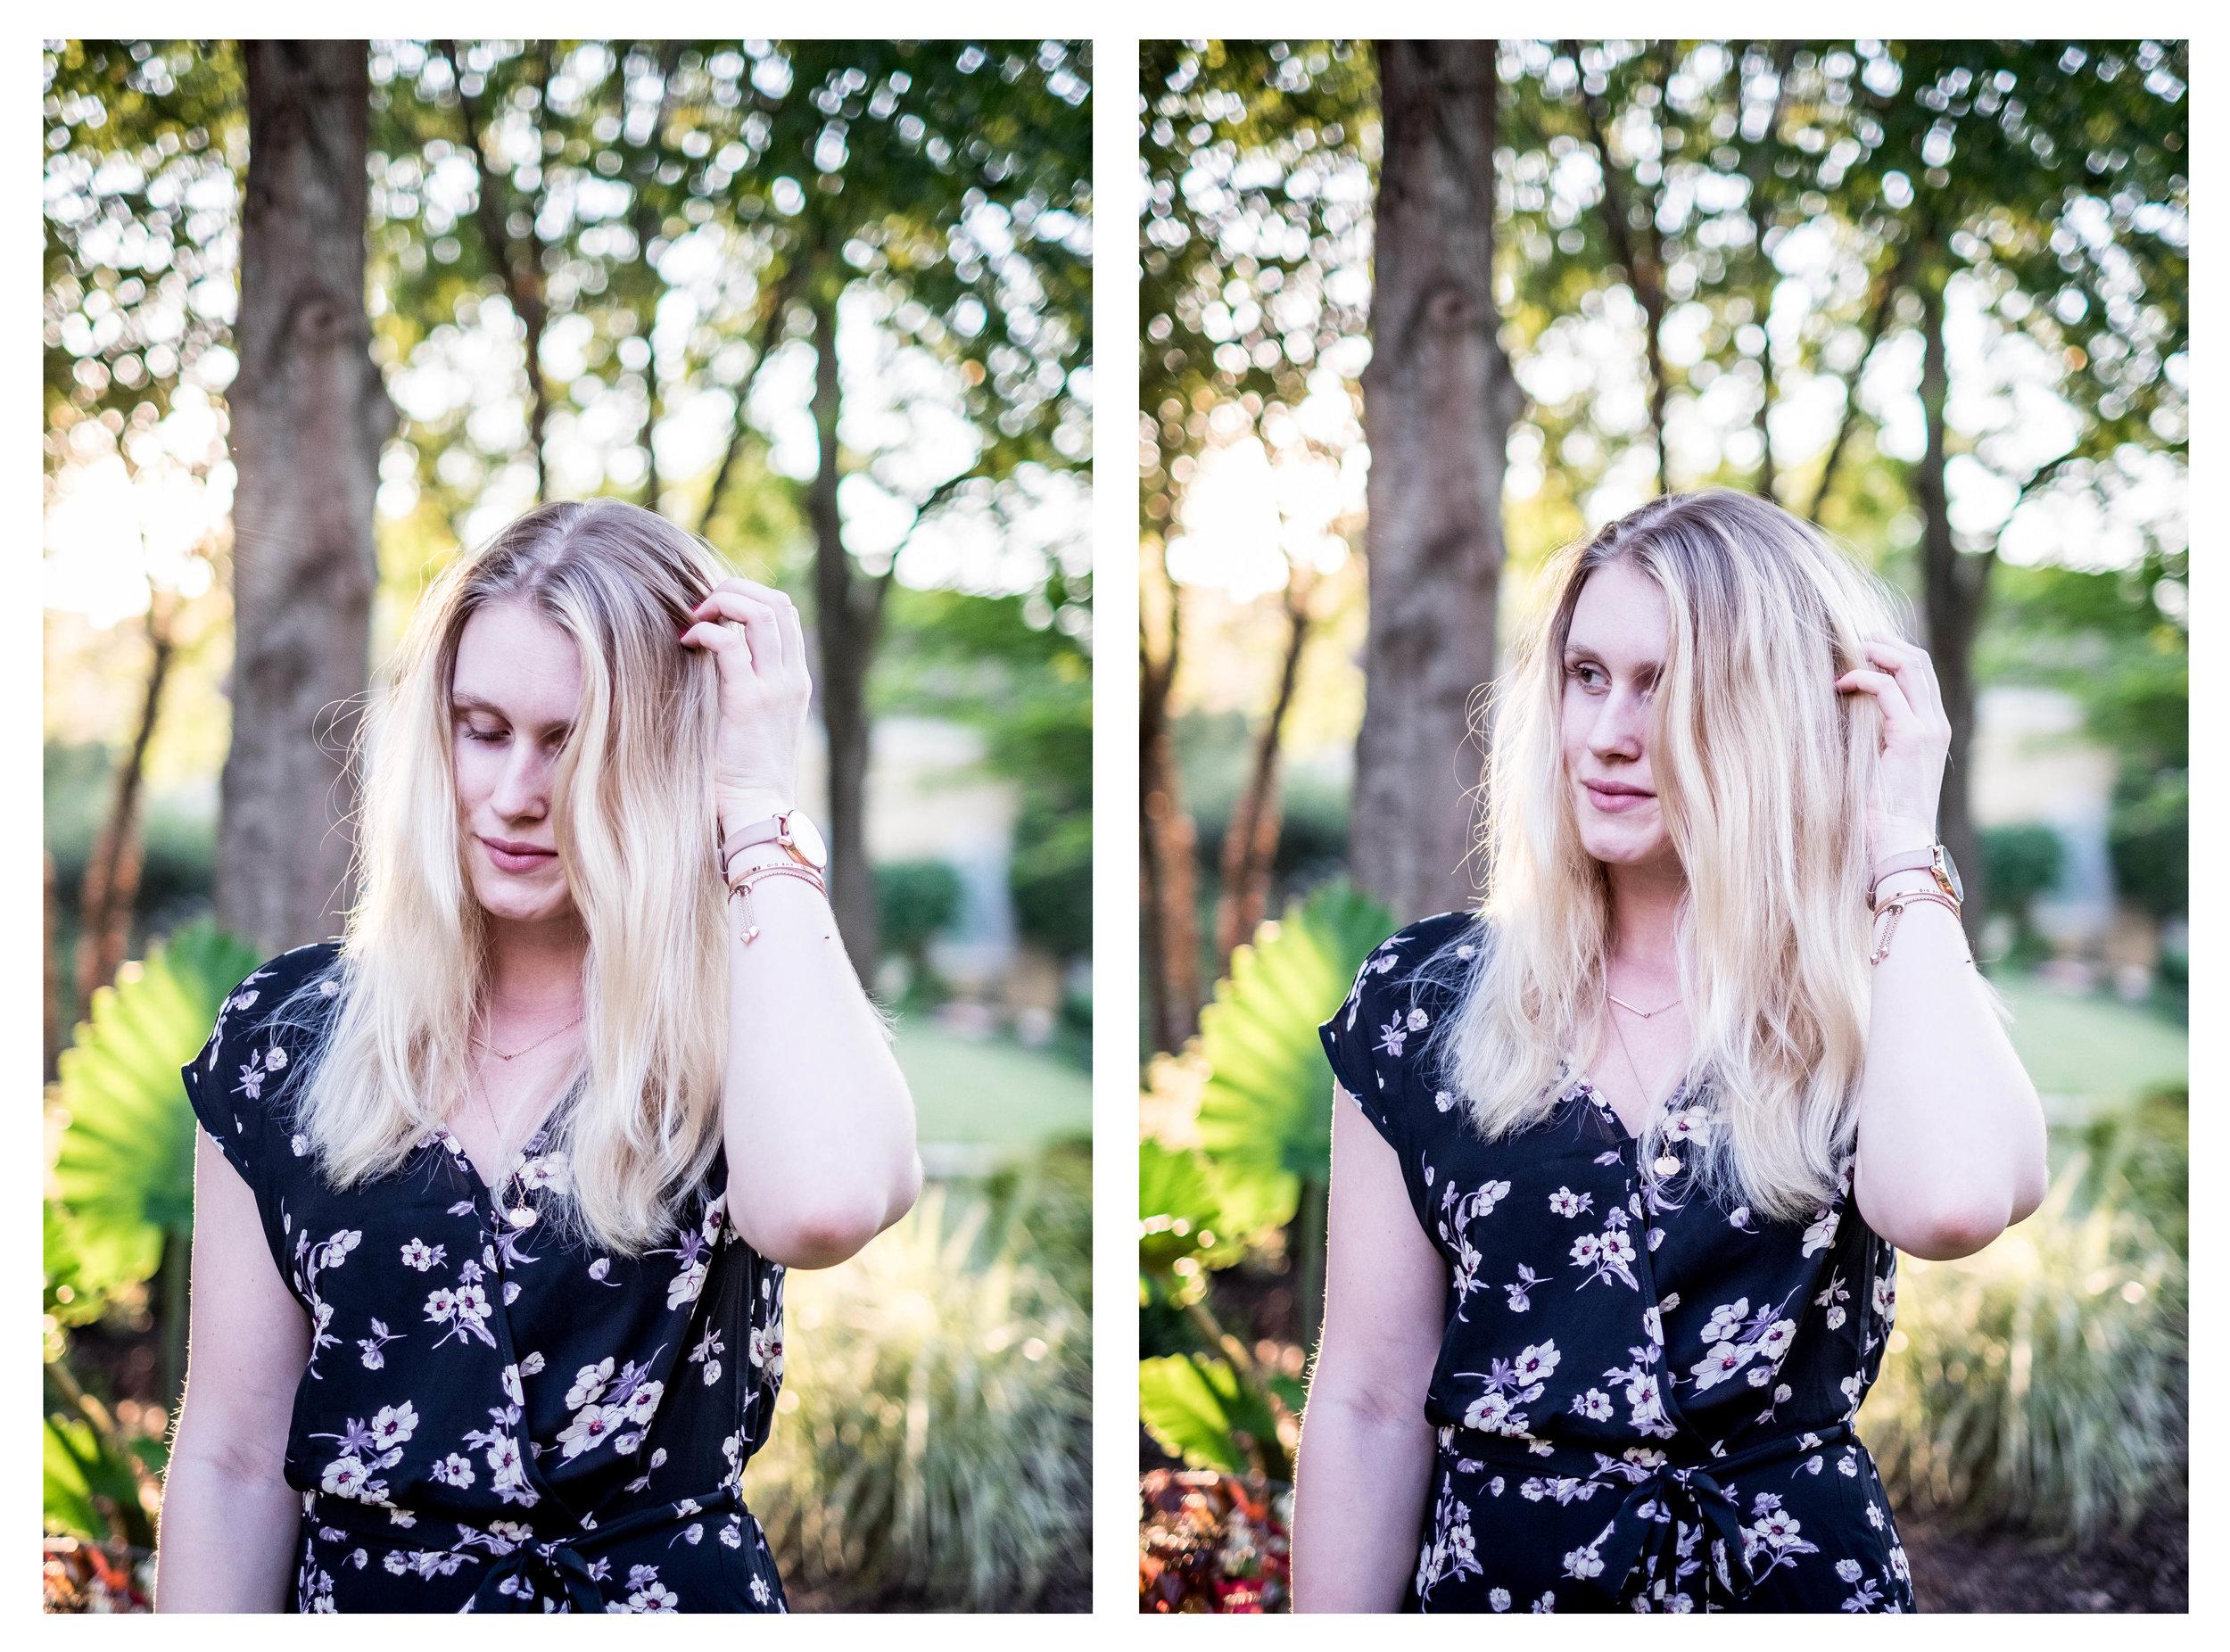 Flower jumpsuit Olivia Vranjes 105.jpg